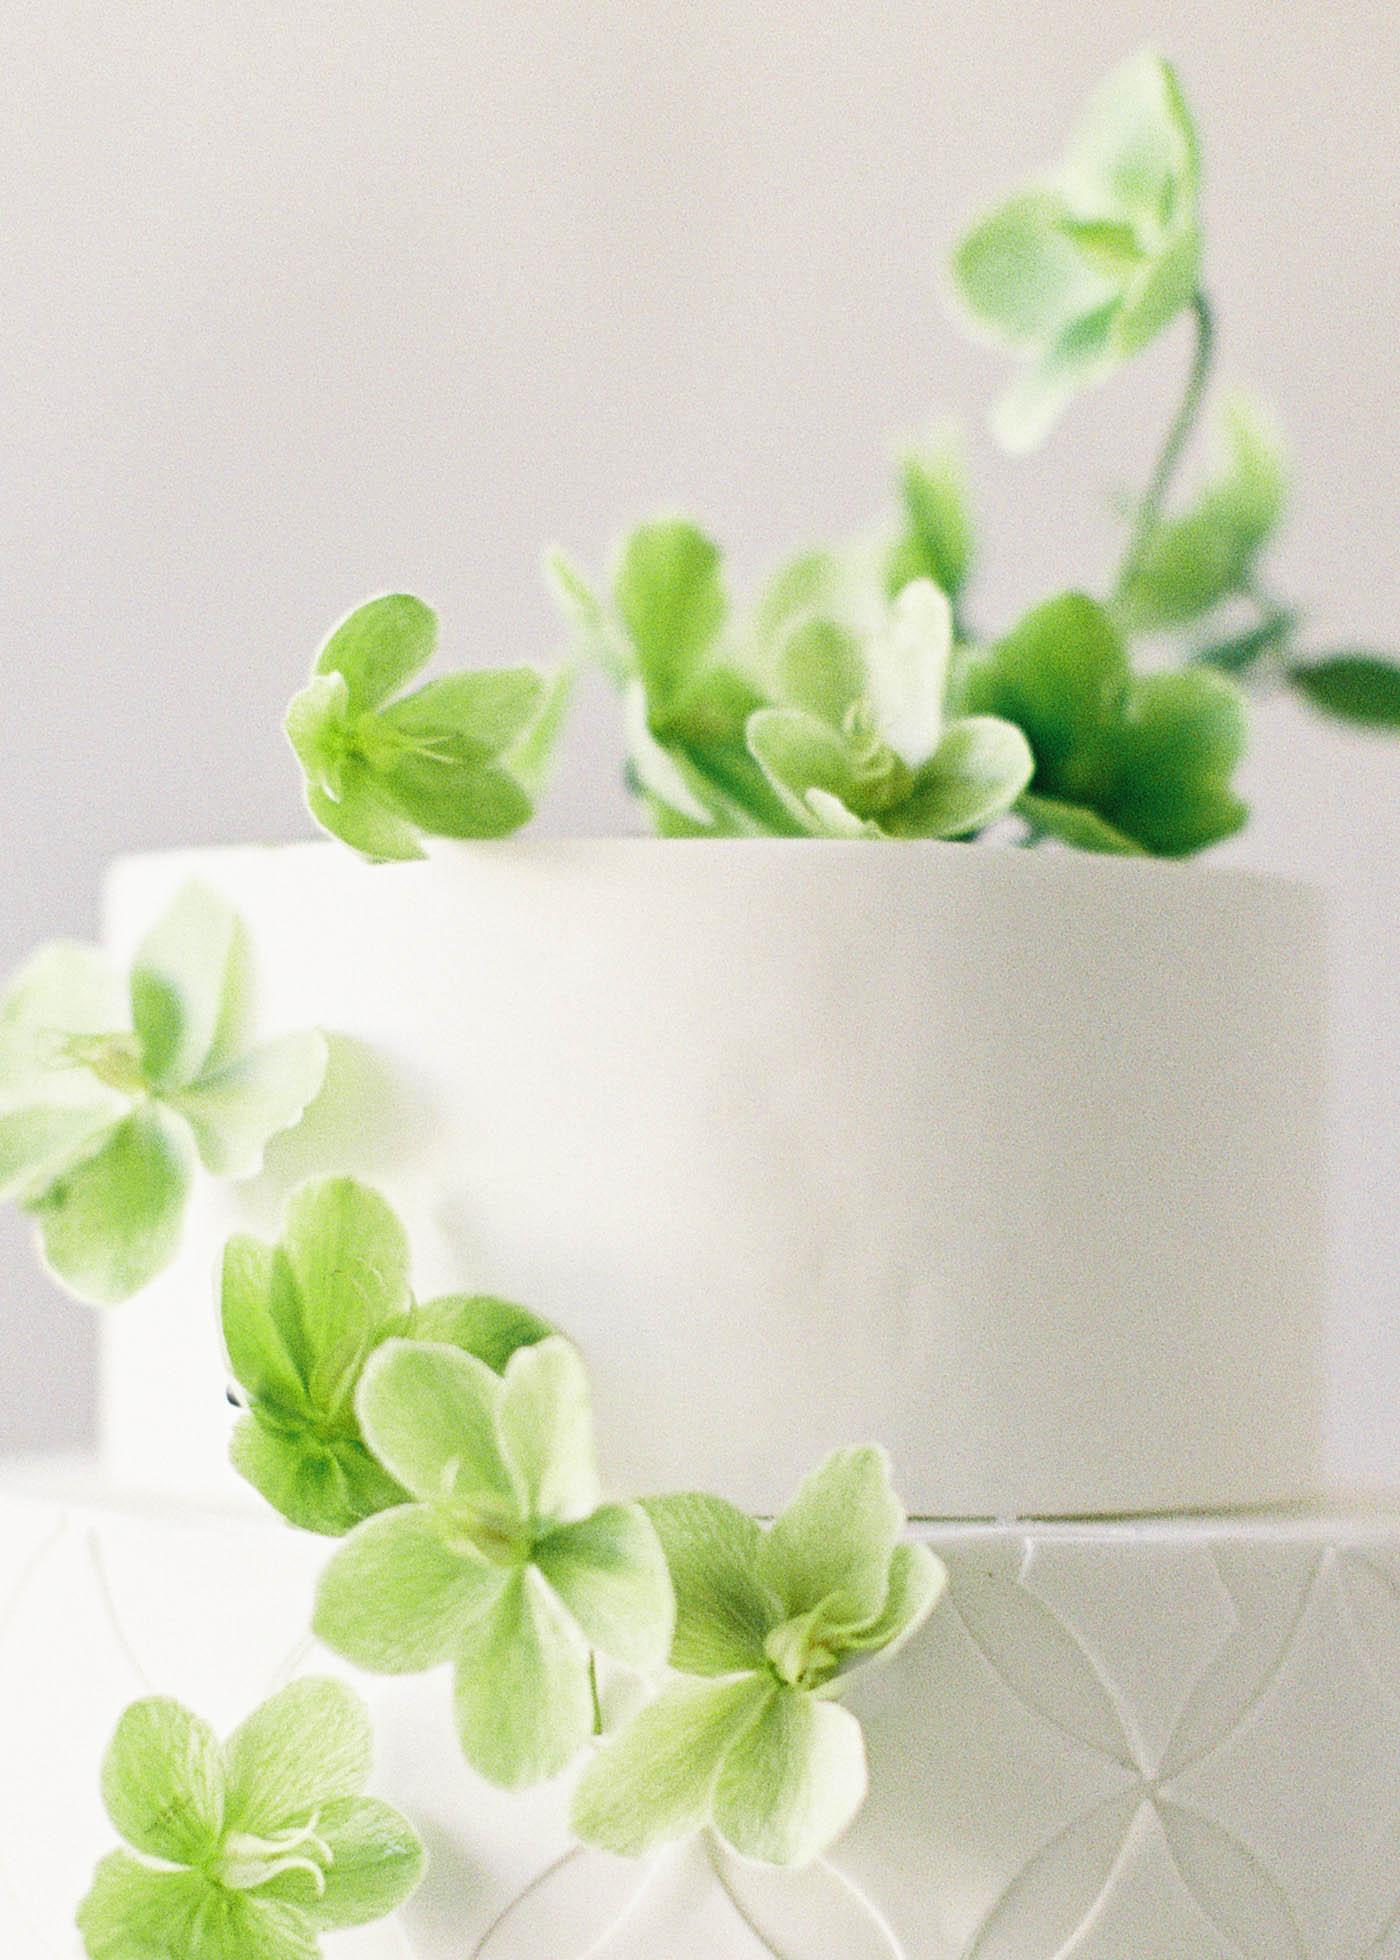 naturalist-cakes-10-Jen_Huang-000486-R1-049-23.jpg